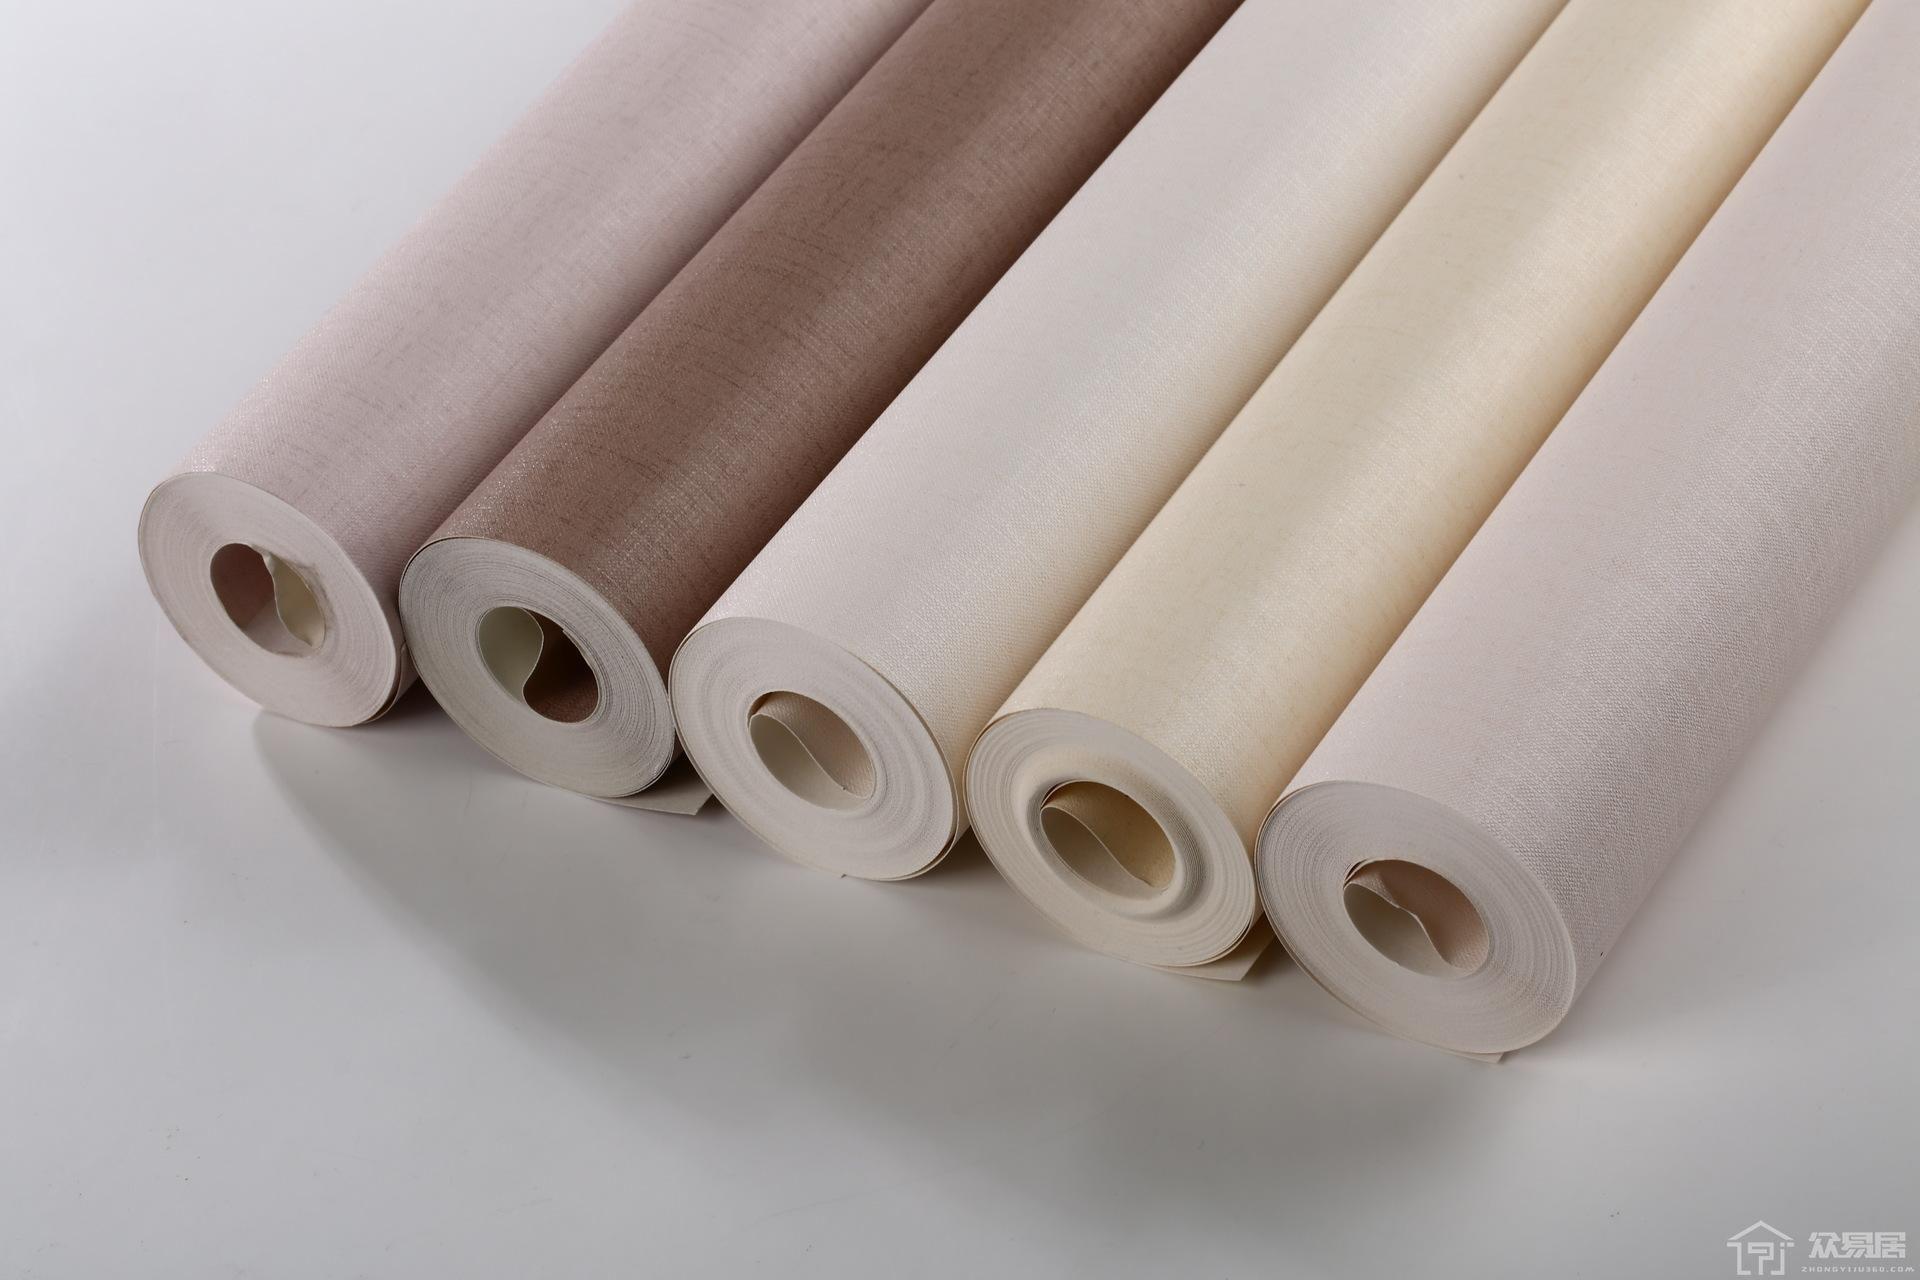 pvc墻紙是什么 pvc墻紙與無紡布墻紙有什么區別